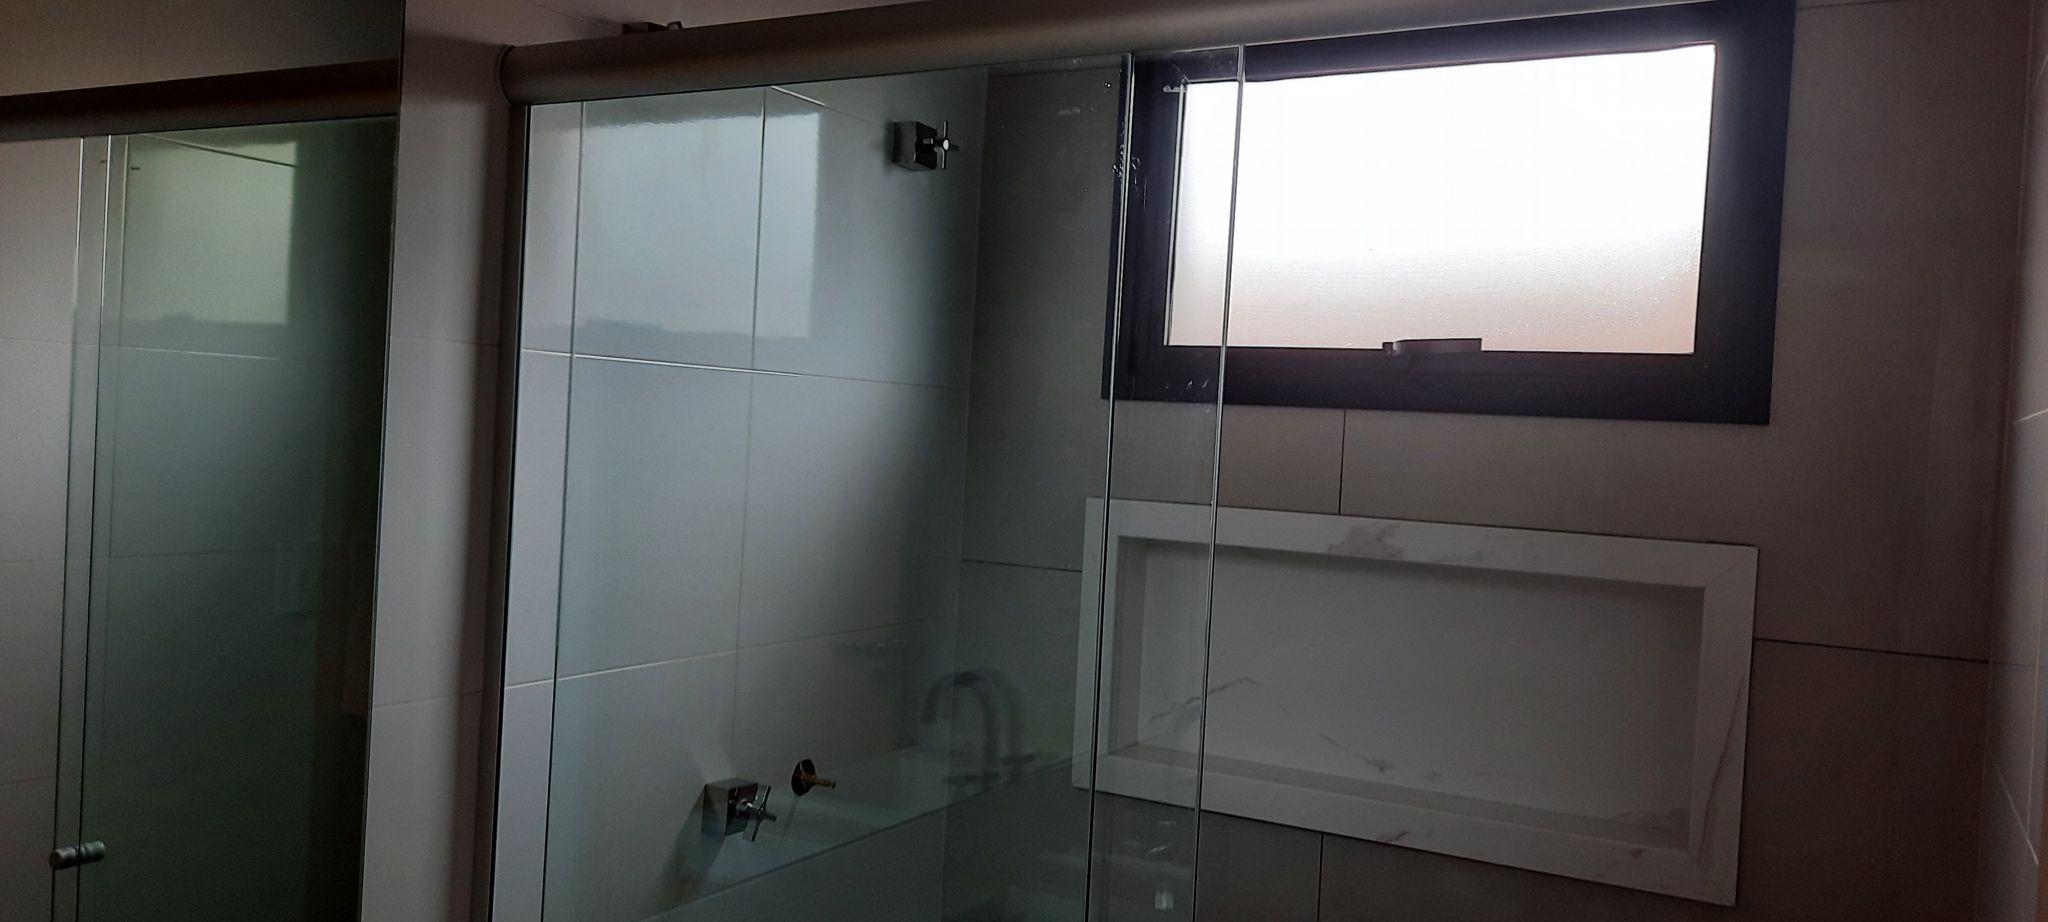 740 - Casa Térrea Vila de Florença - 3 Suítes